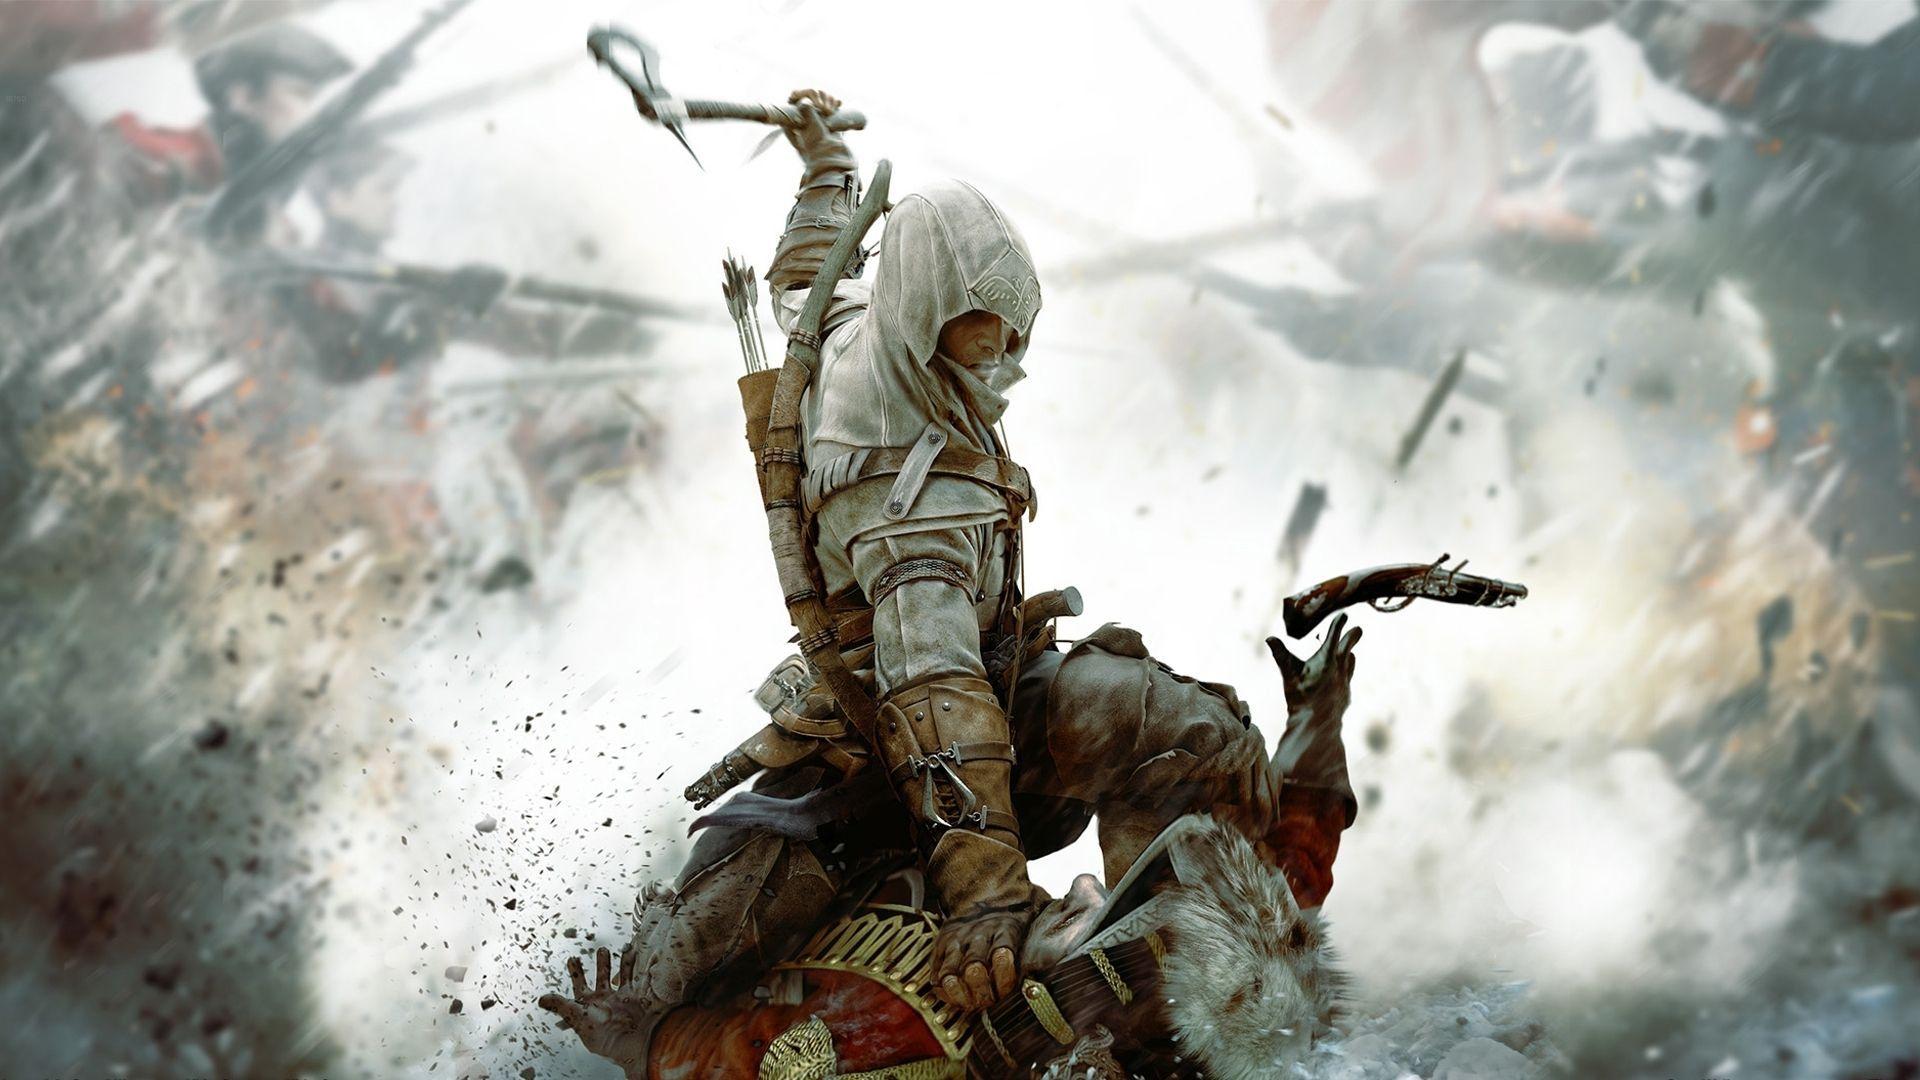 10 New Assassins Creed Wallpaper 1366x768 Full Hd 1080p For Pc Desktop 4k Assassin S Creed Wallpaper Assassins Creed 3 Assassins Creed